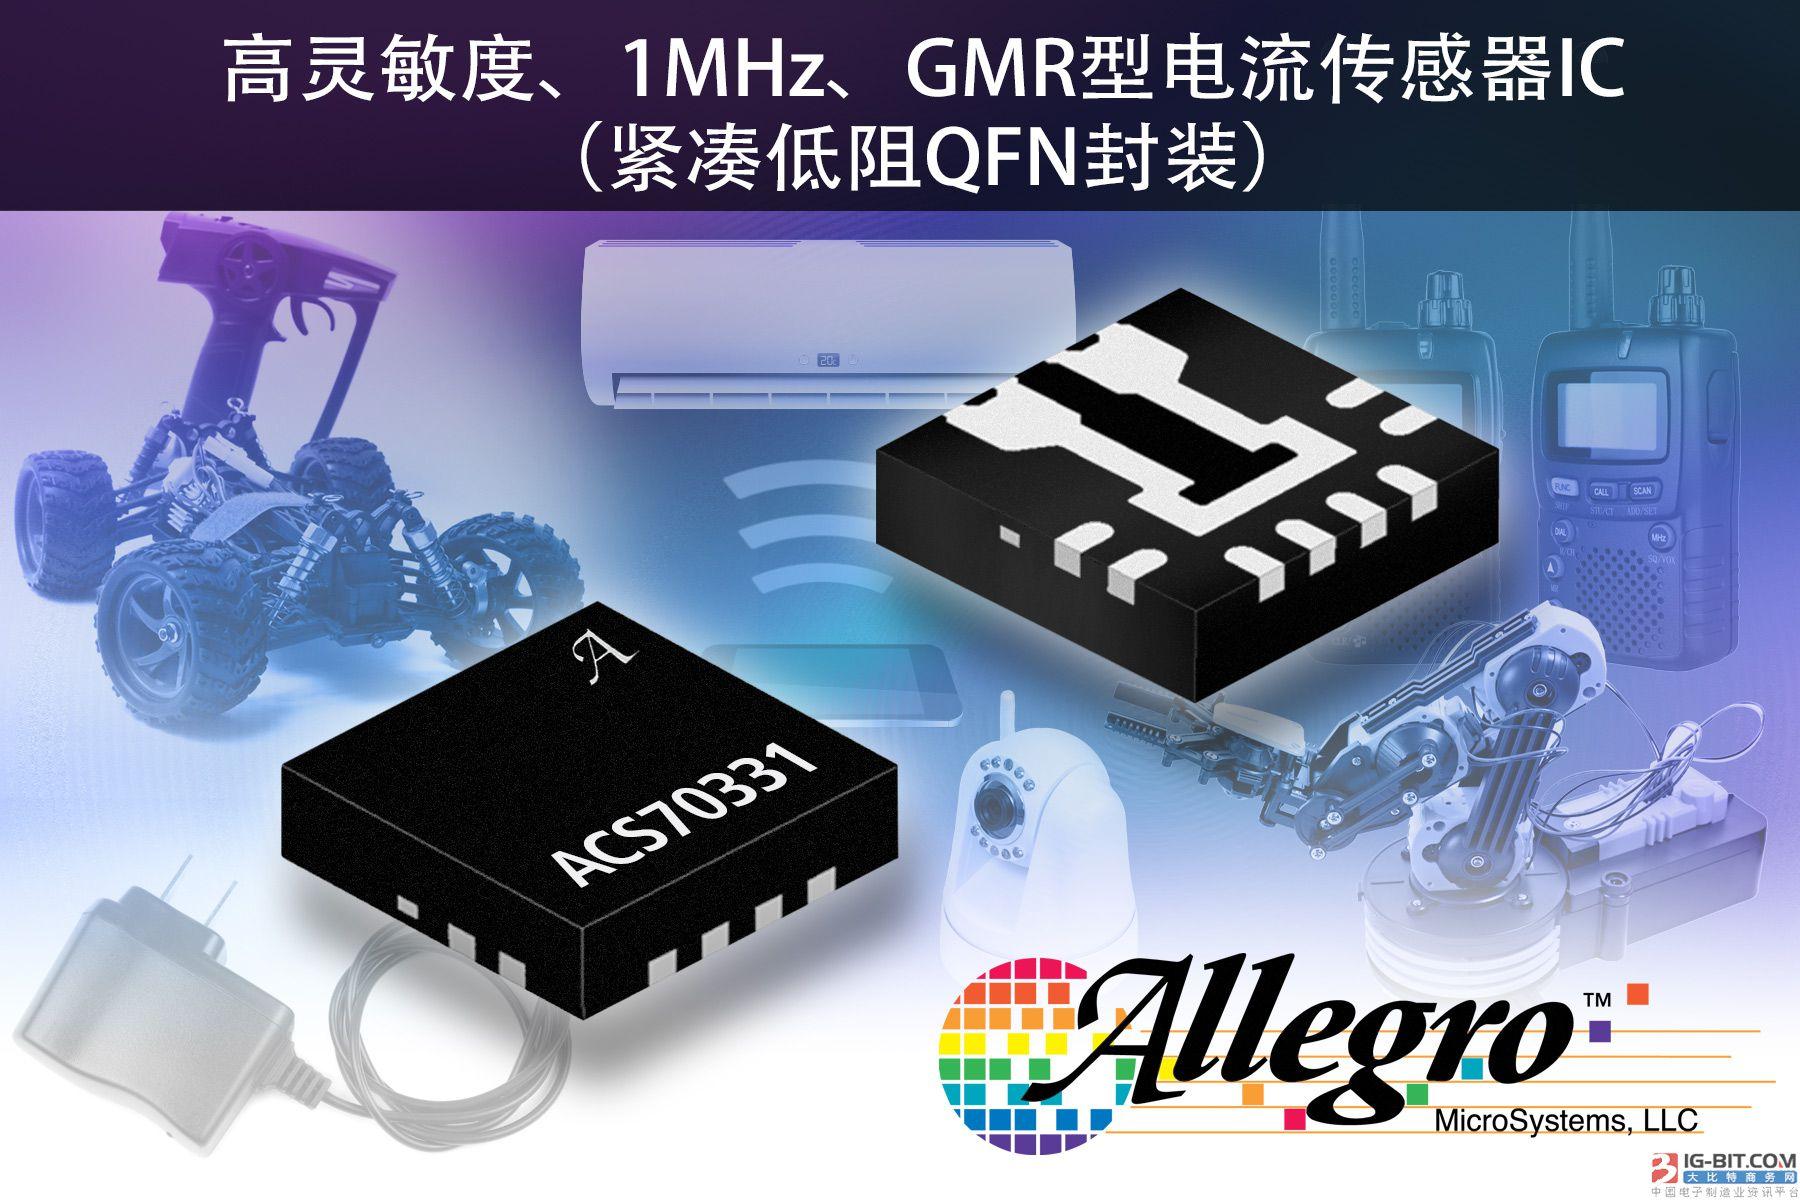 Allegro MicroSystems, LLC针对小于5 A应用推出首款完全集成的高灵敏度电流传感器